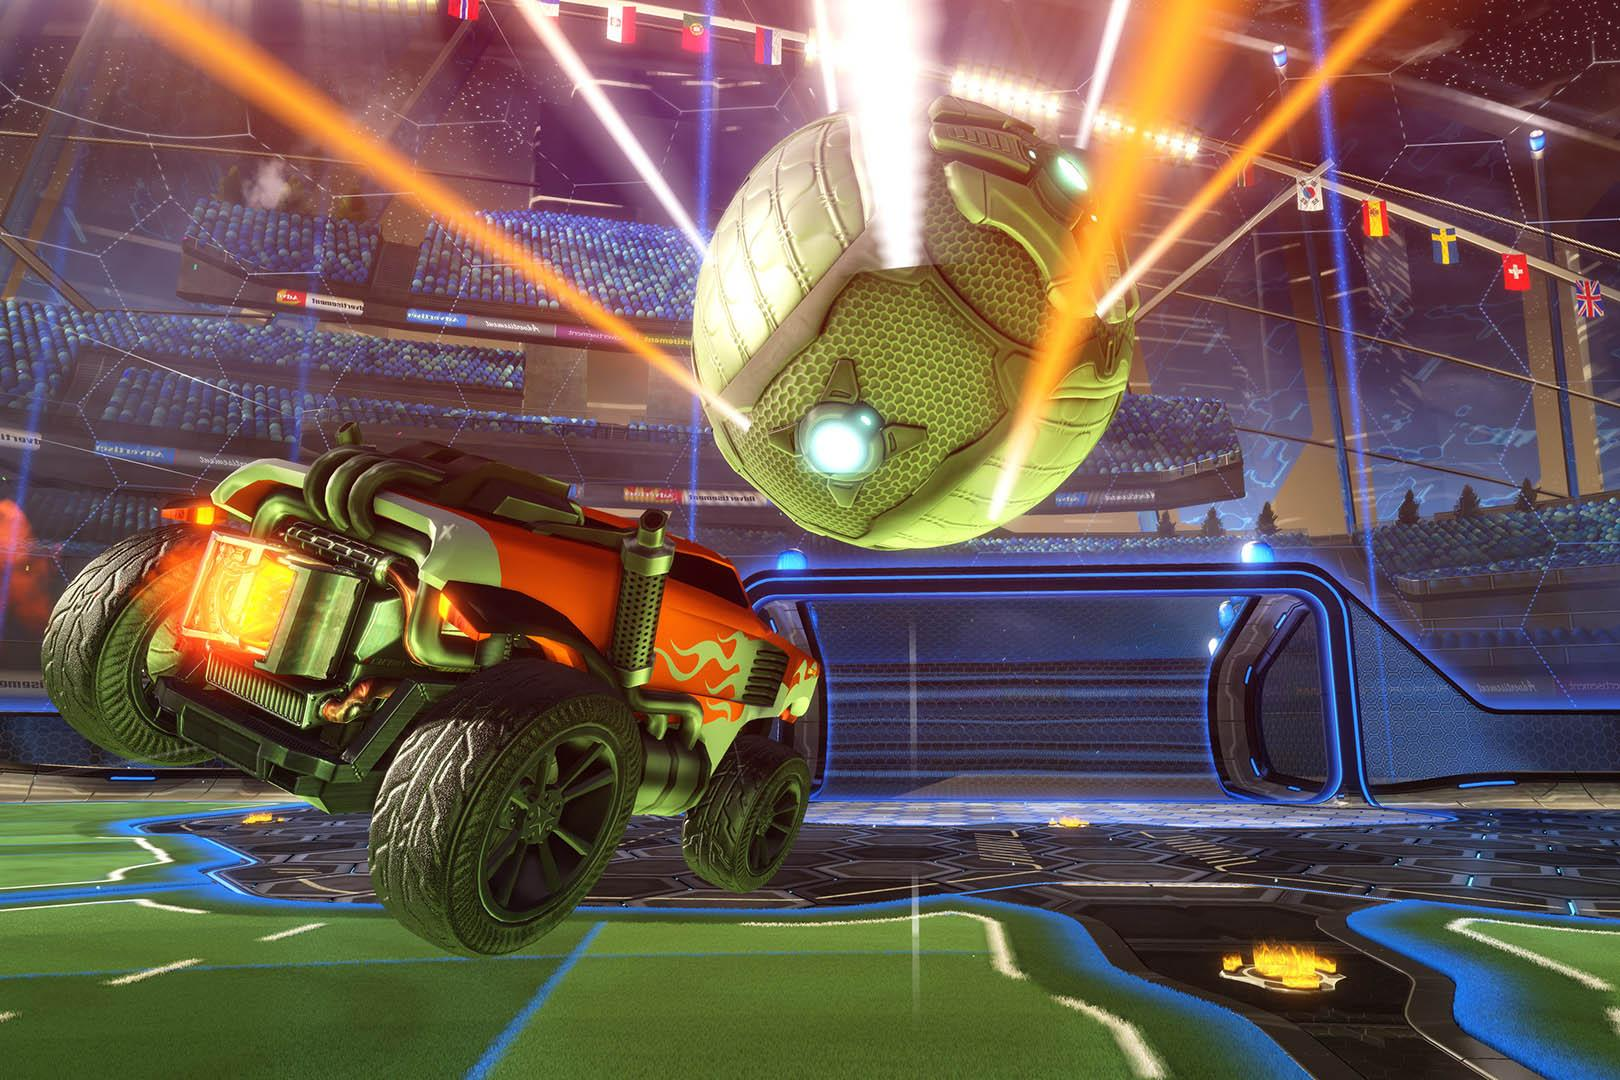 Rocket League has free Halloween DLC inbound